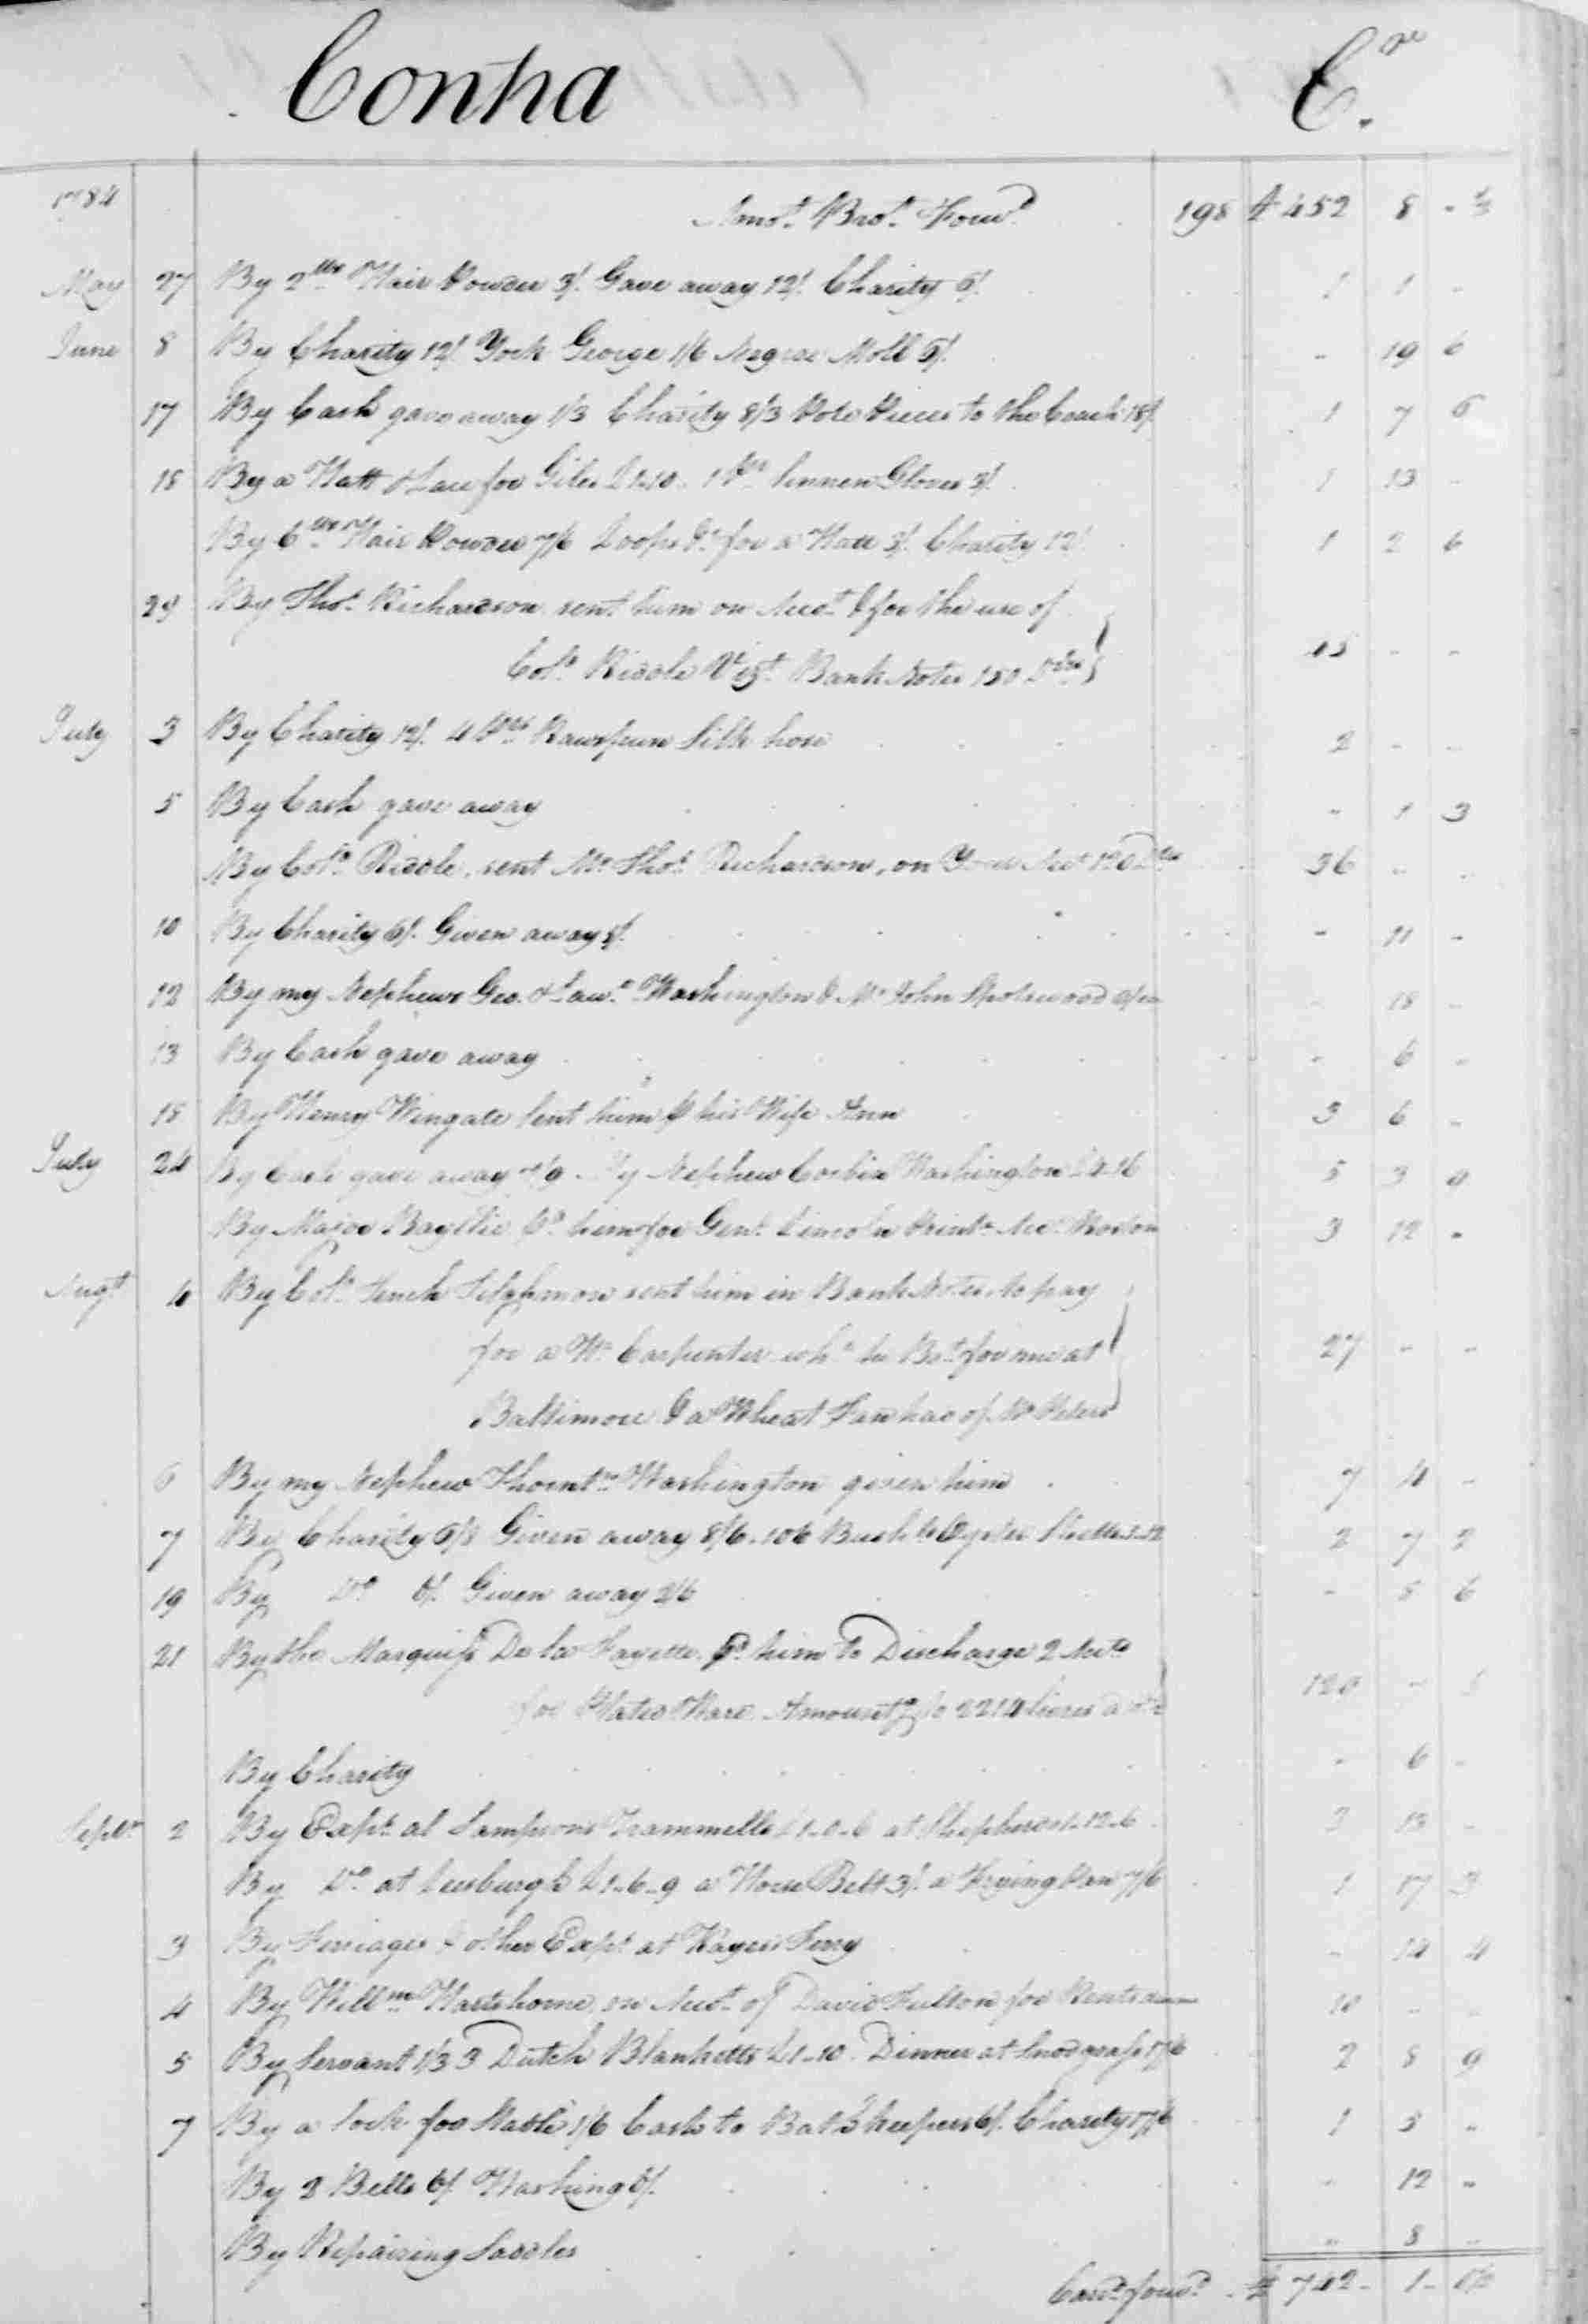 Ledger B, folio 199, right side